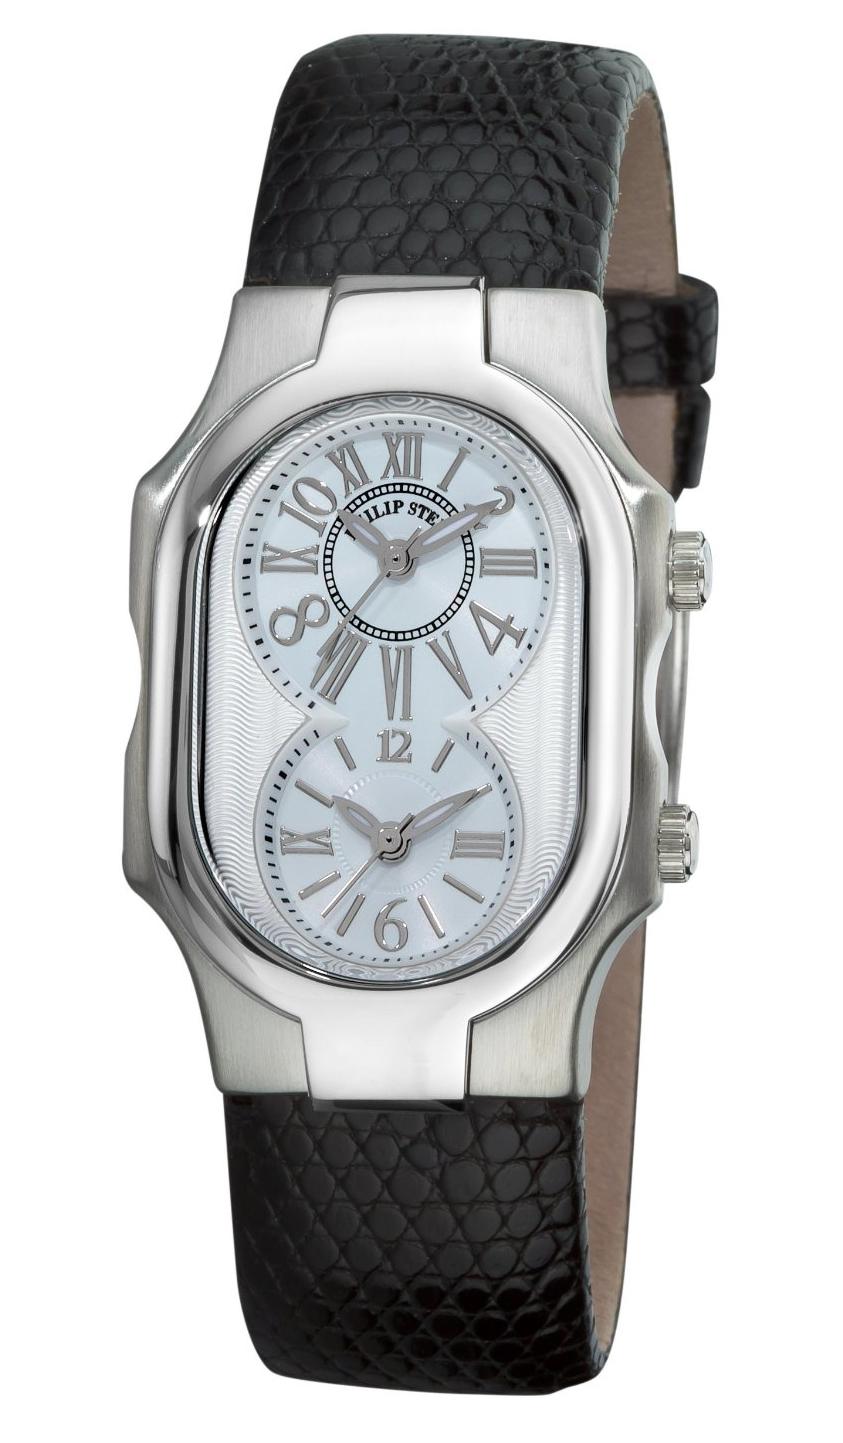 Philip stein signature small ladies watch model 1 mw zb for Philip stein watches